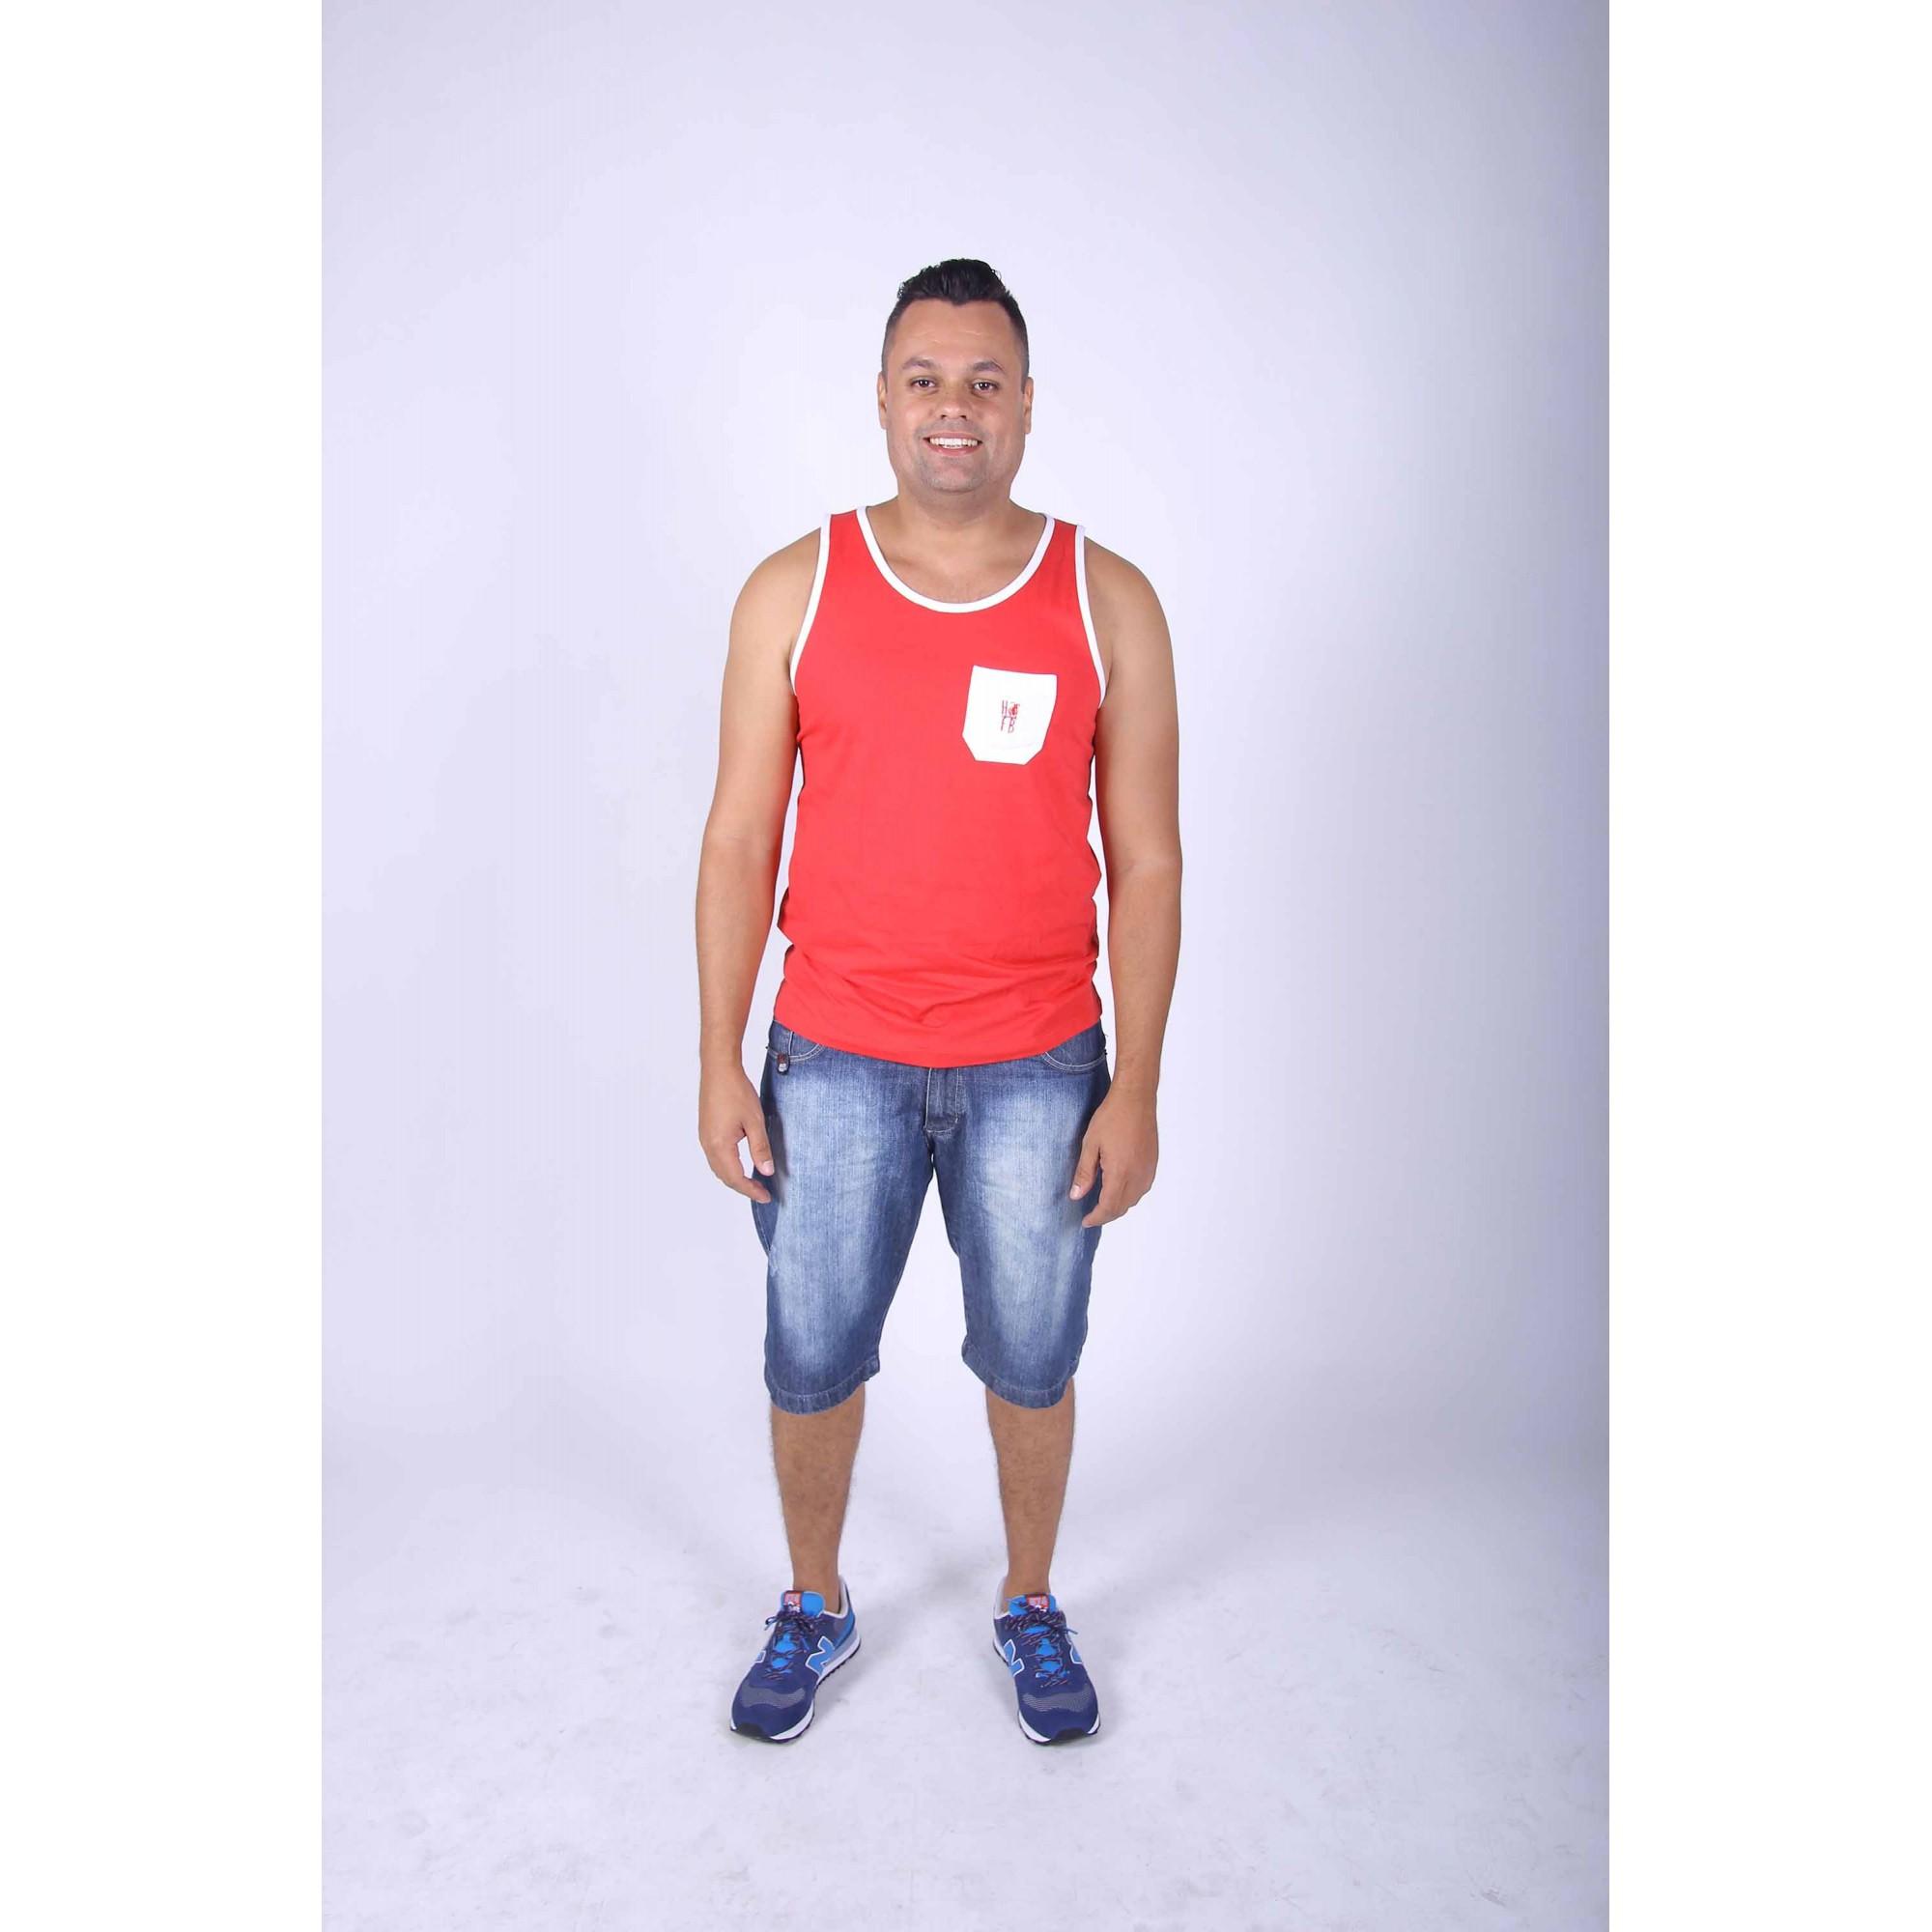 Regata Masculina Vermelha  - Heitor Fashion Brazil